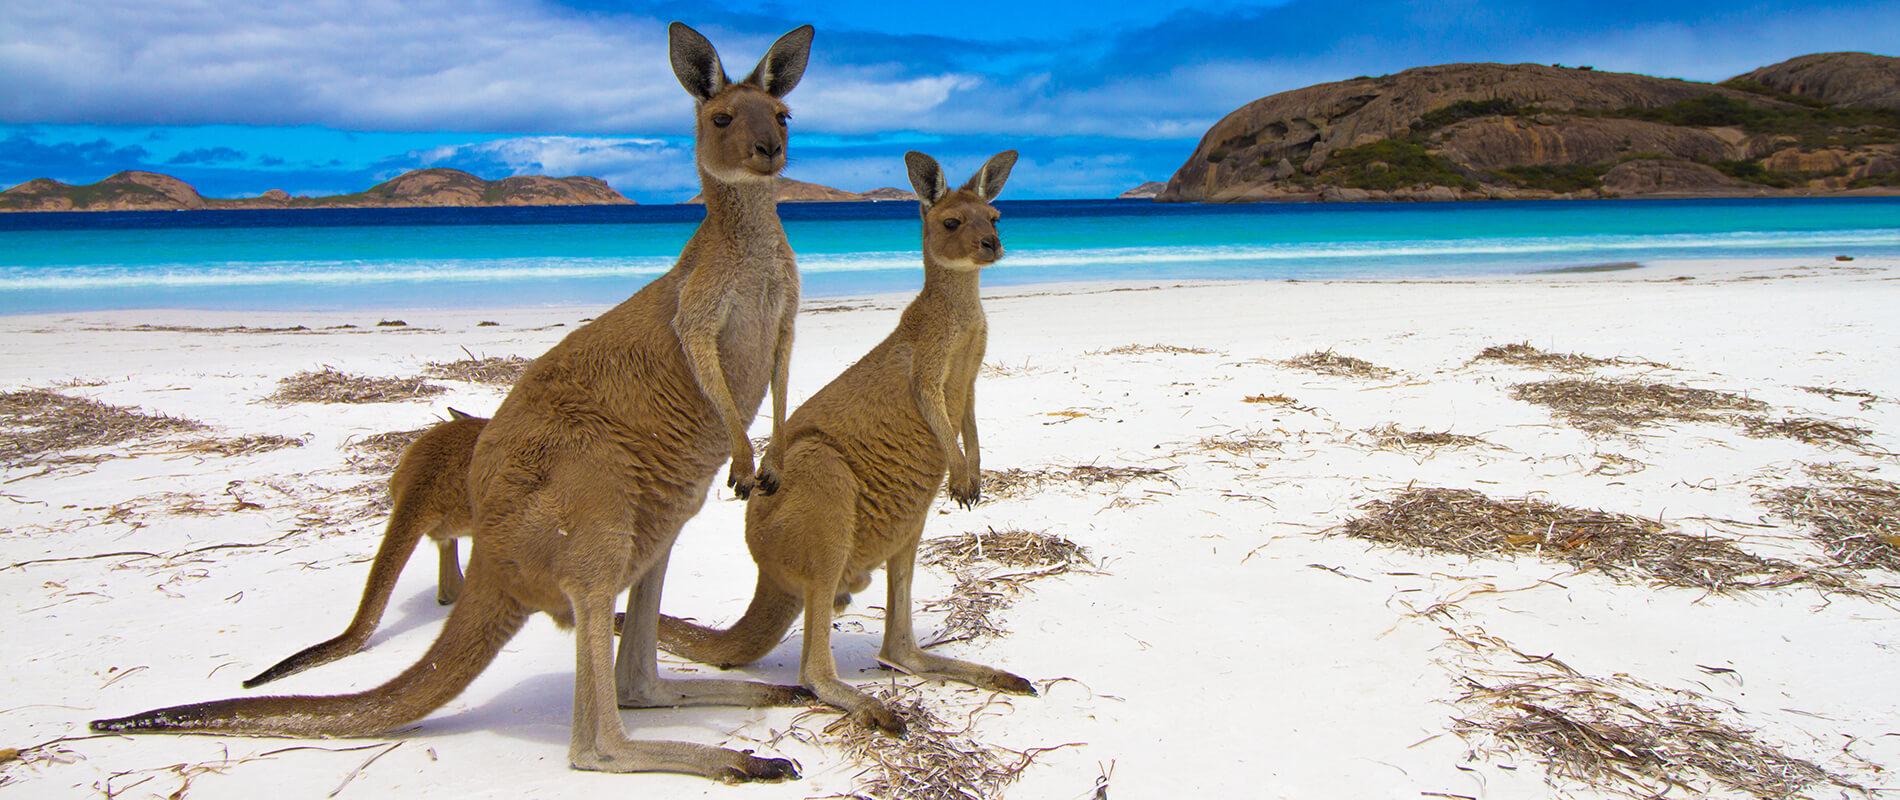 Kangaroo Island, an unspoiled oasis in South Australia